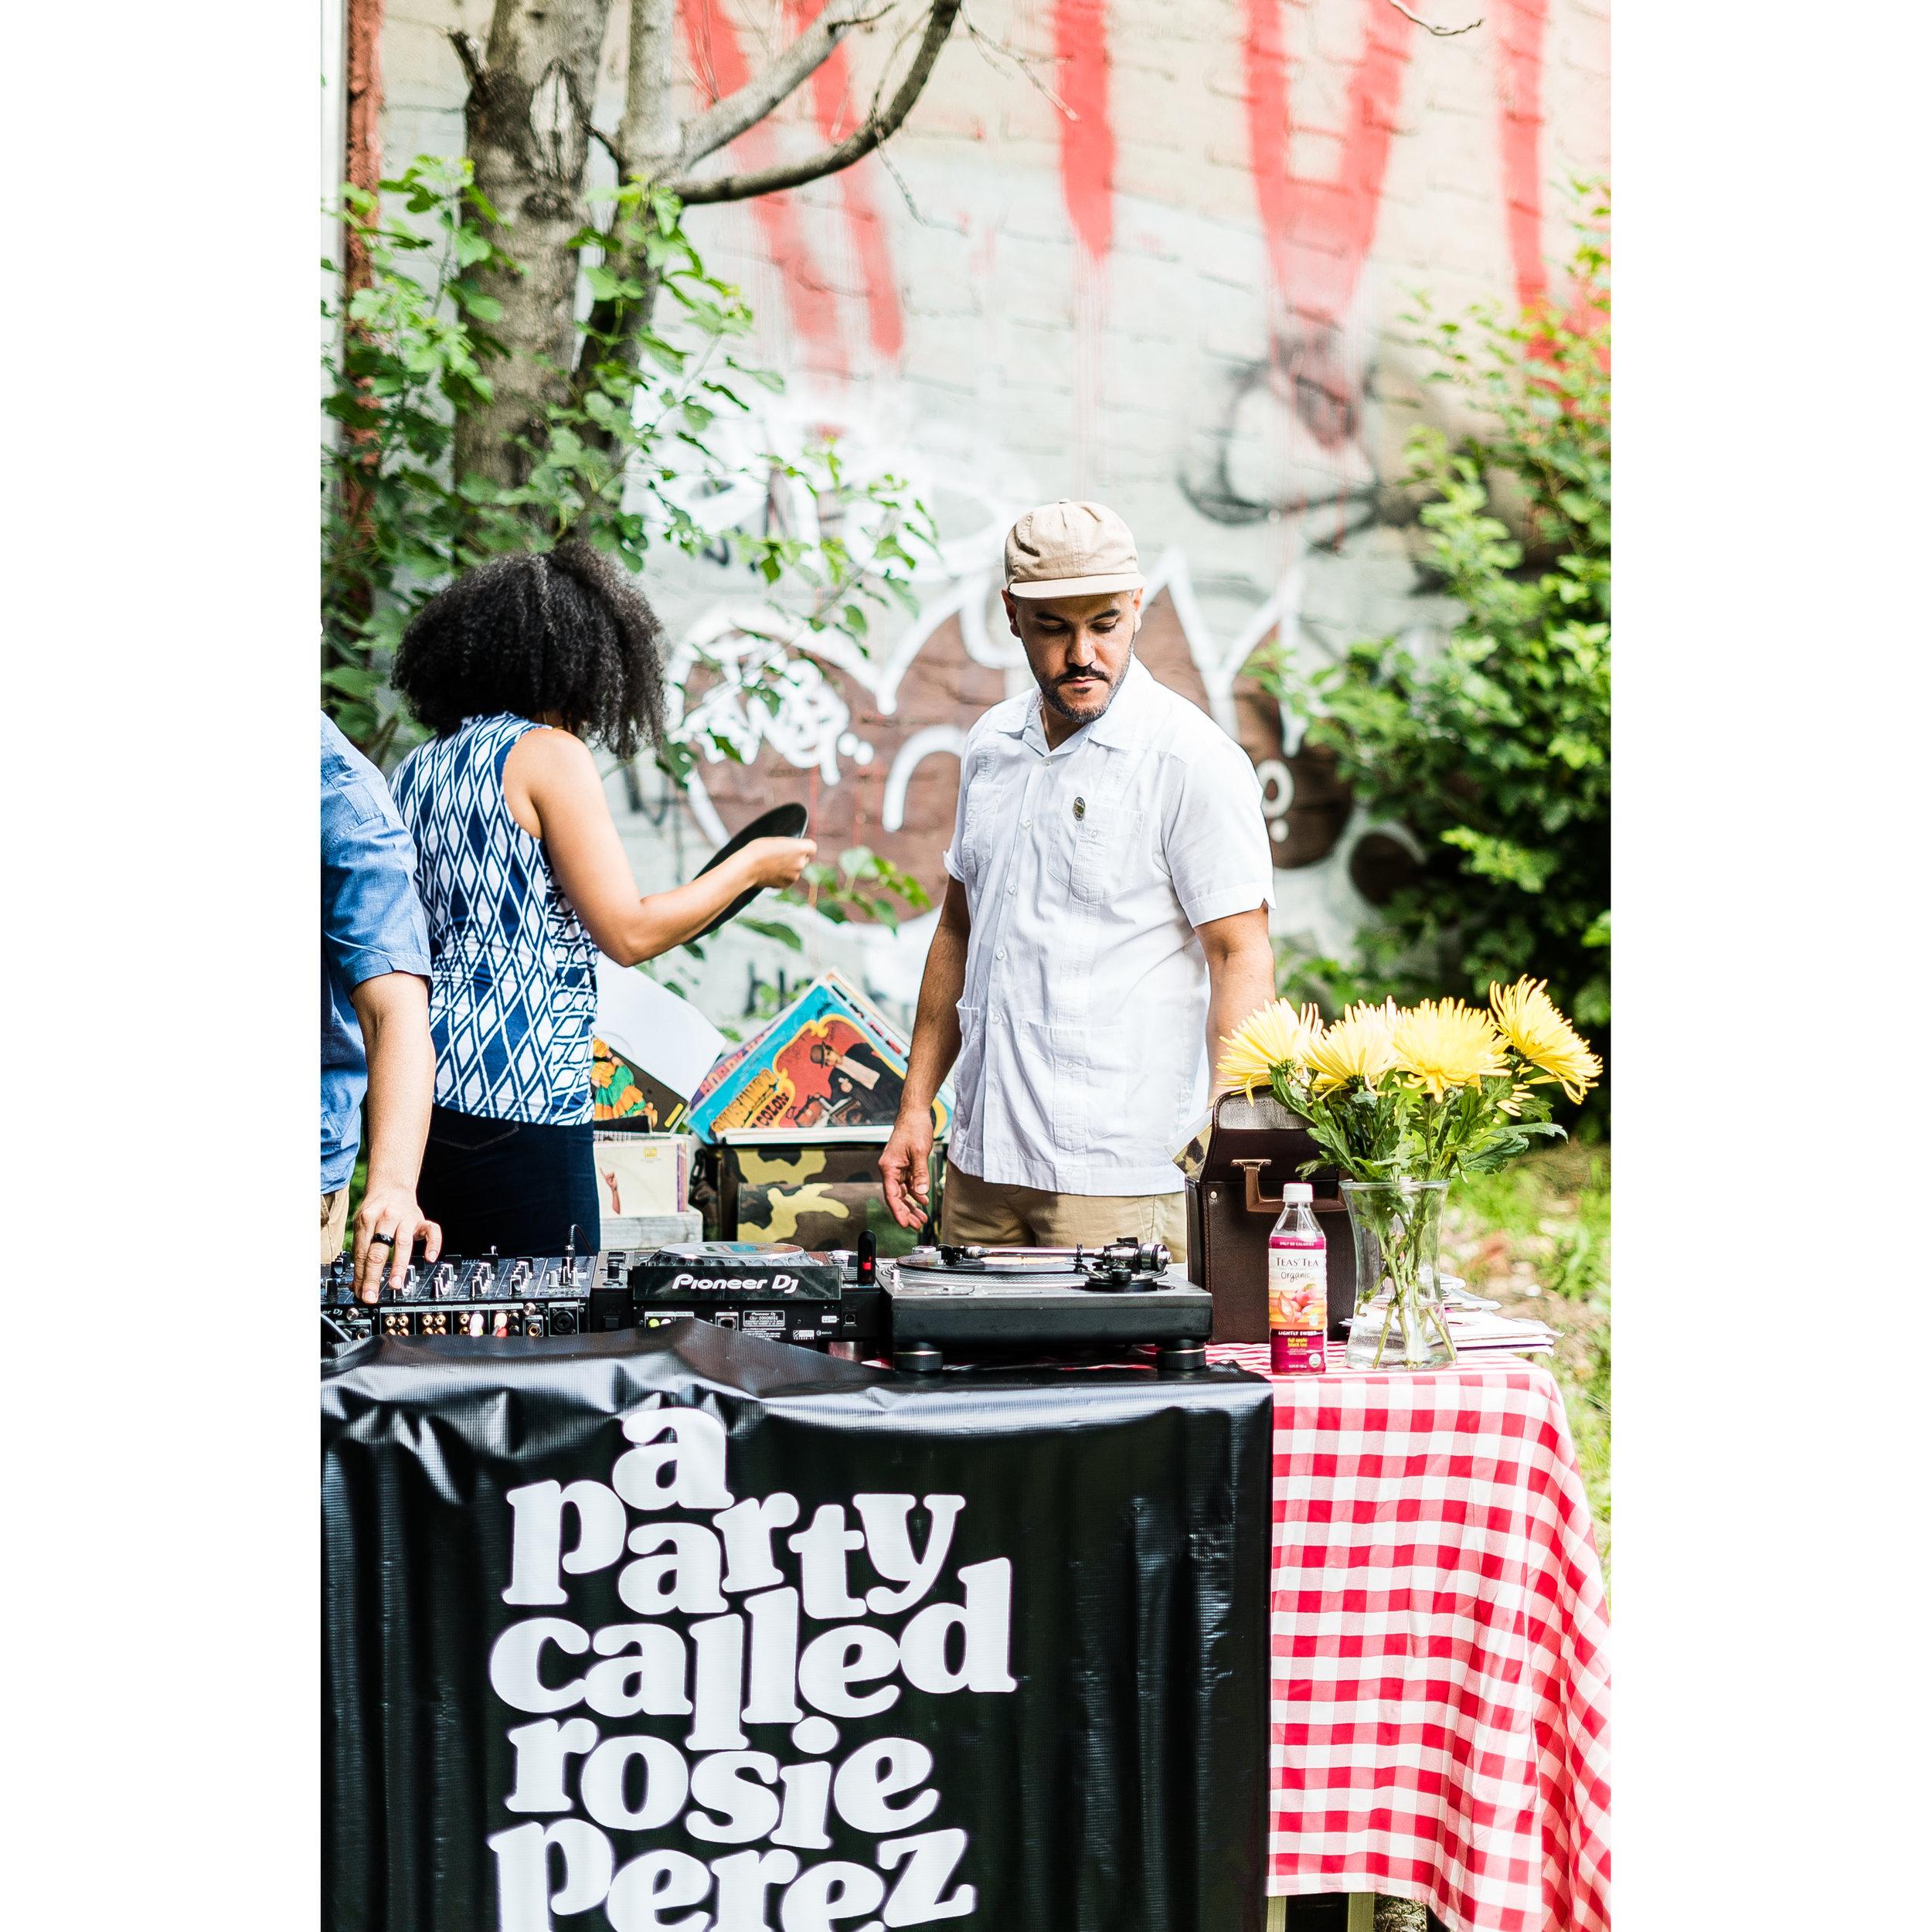 DJ 106-2017 A Party Called Rosie Perez & Boiler Room_006-Edit.jpg